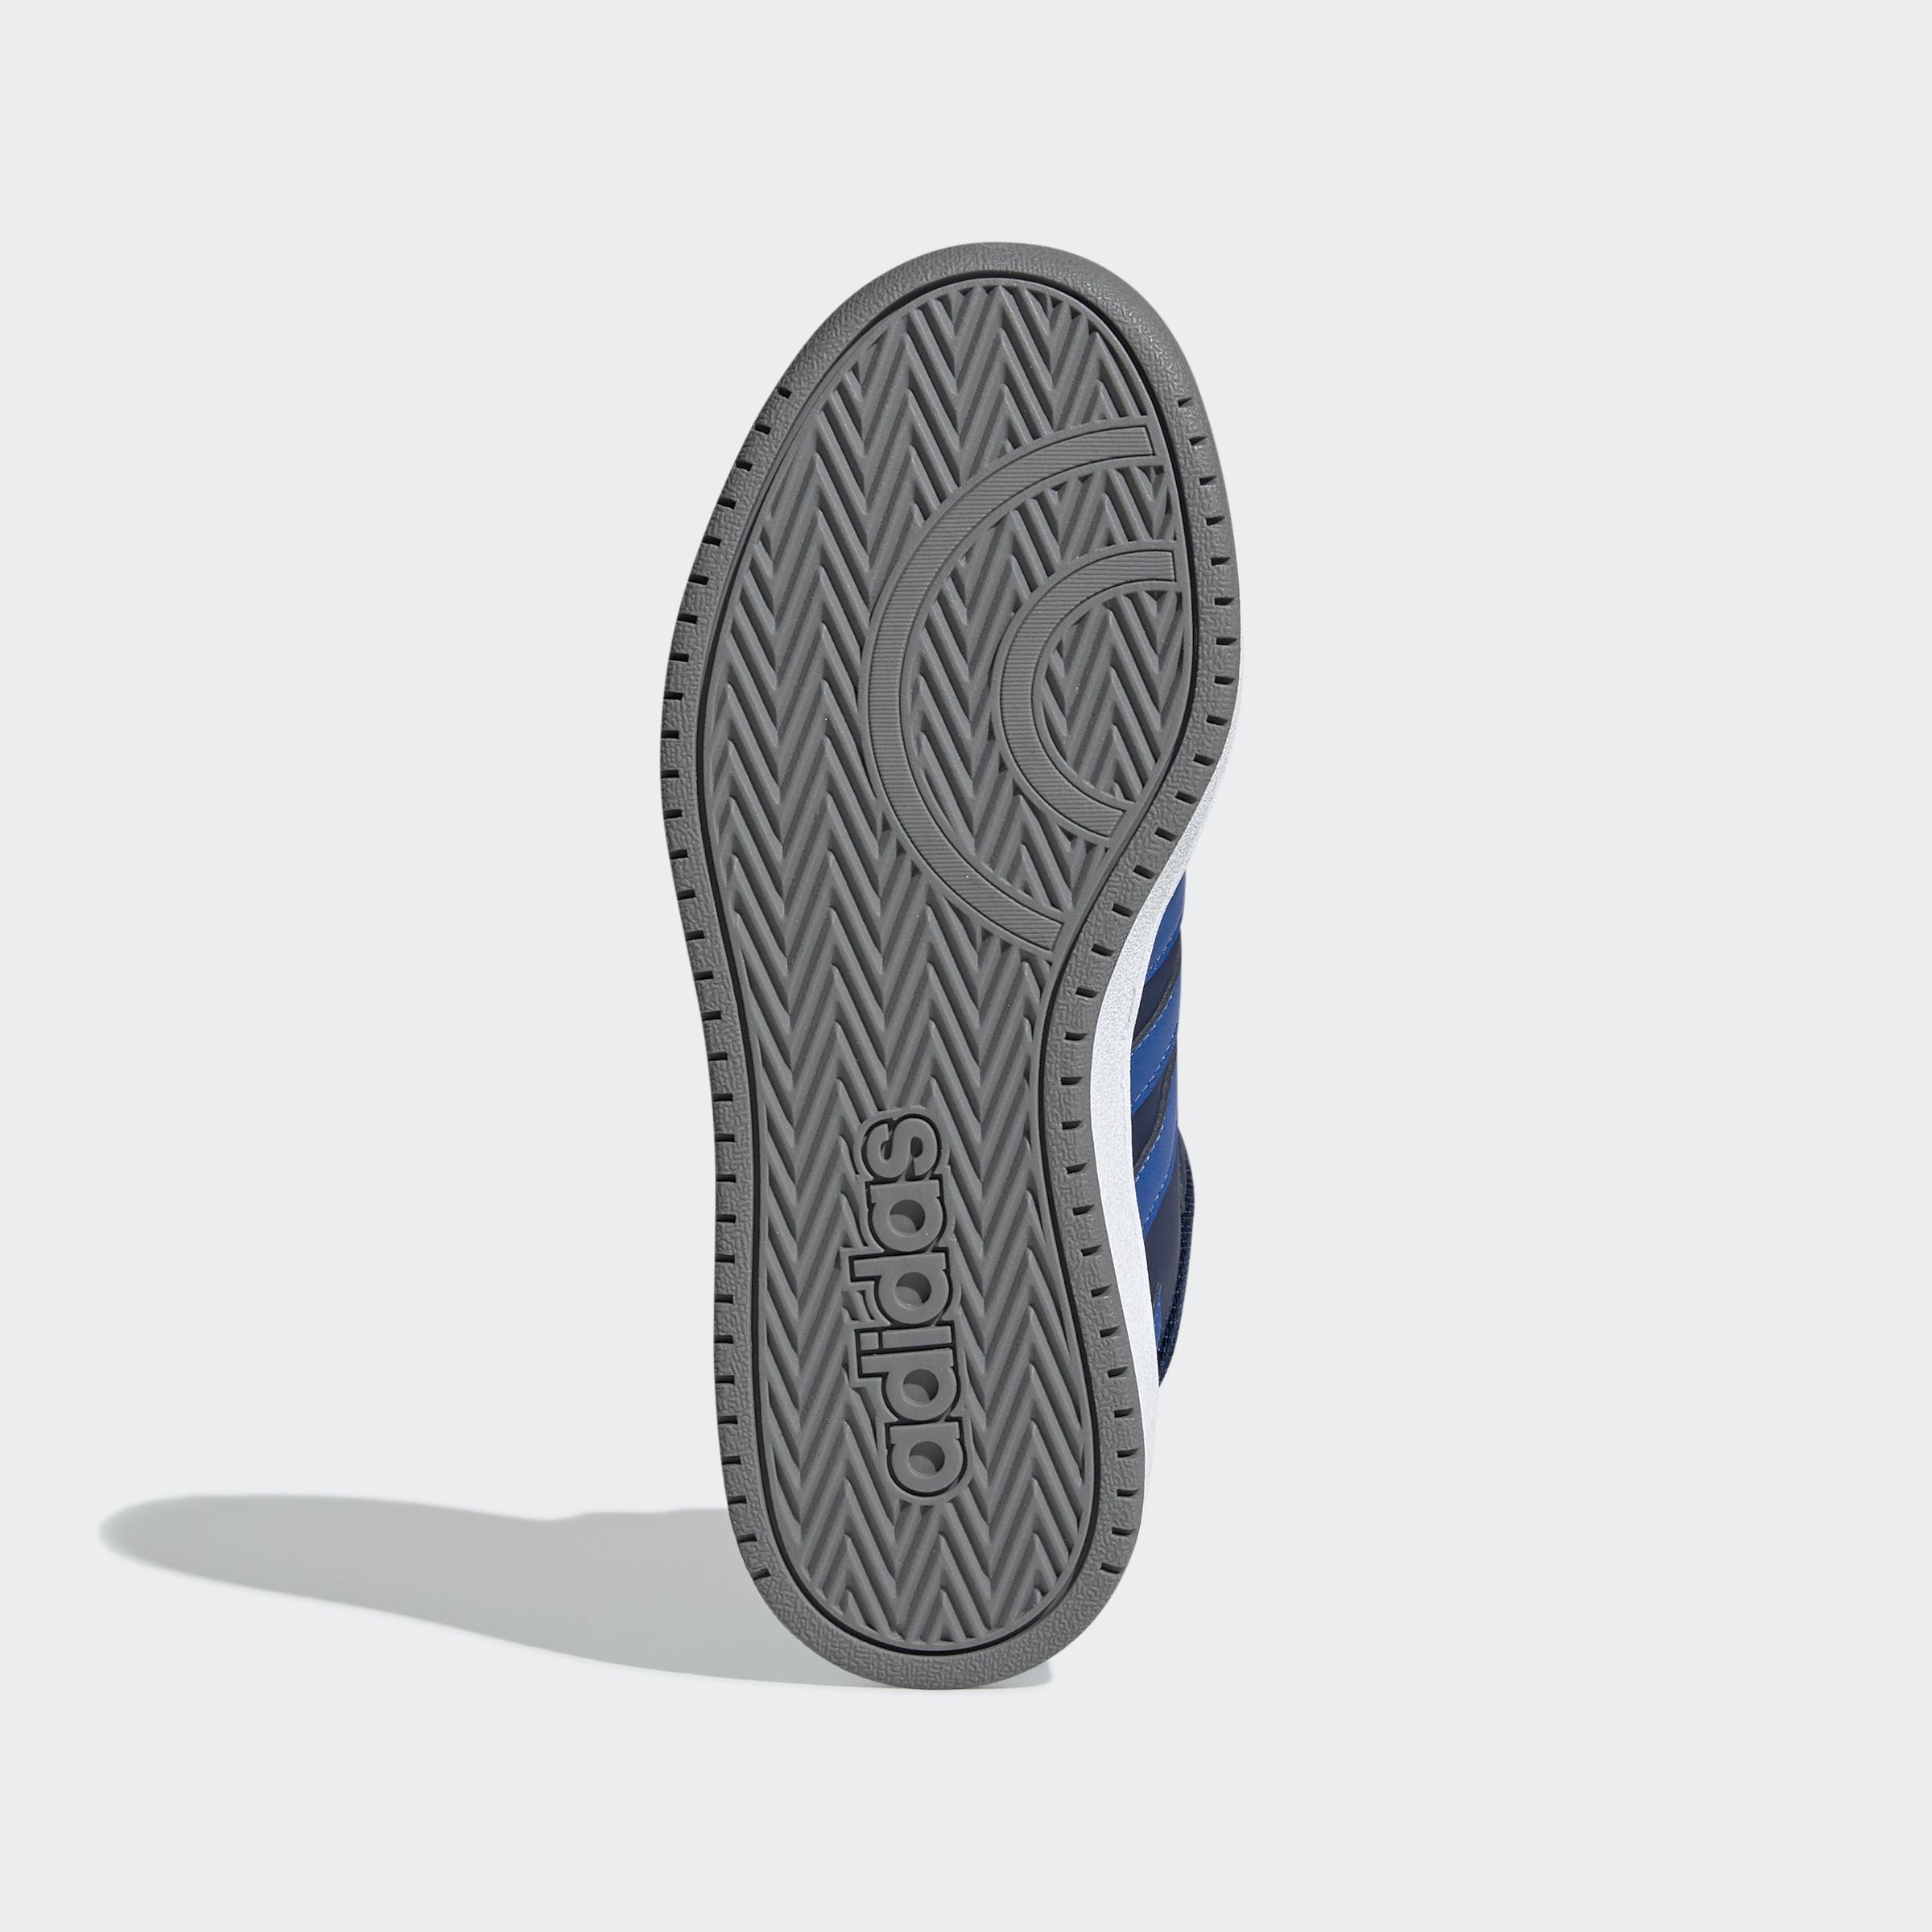 adidas-Hoops-2-0-Mid-Shoes-Kids-039-High-Tops thumbnail 13